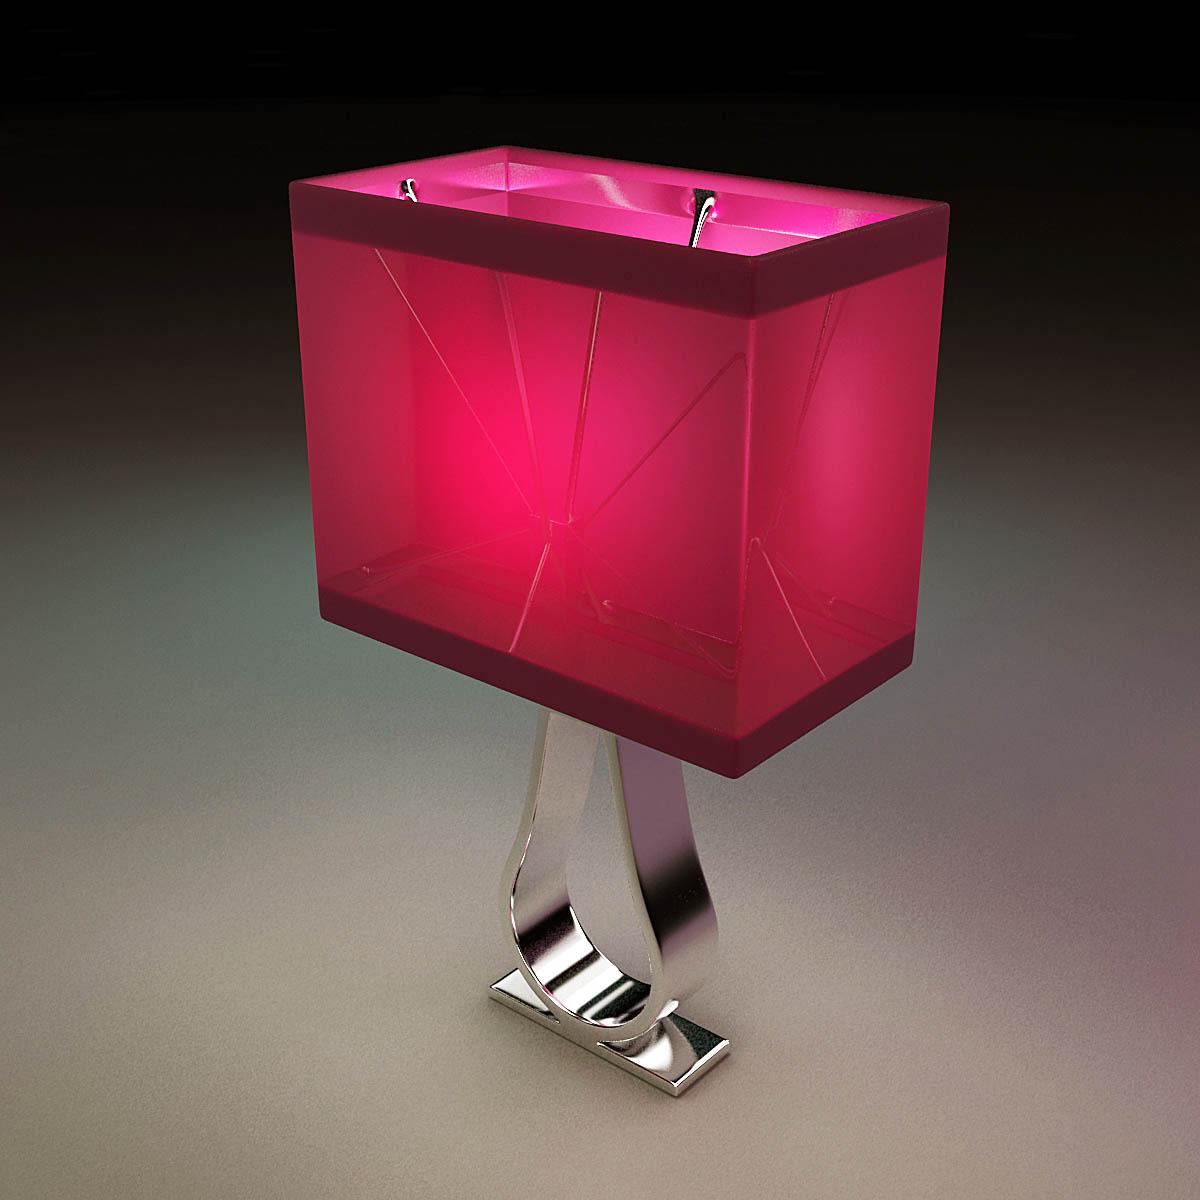 Ikea table lamps 10 in 1 by sercancetin 3docean lampang naturel 2g naturelg stockholm 2g stockholmg vate 2g vateg vidja 2g vidjag geotapseo Image collections